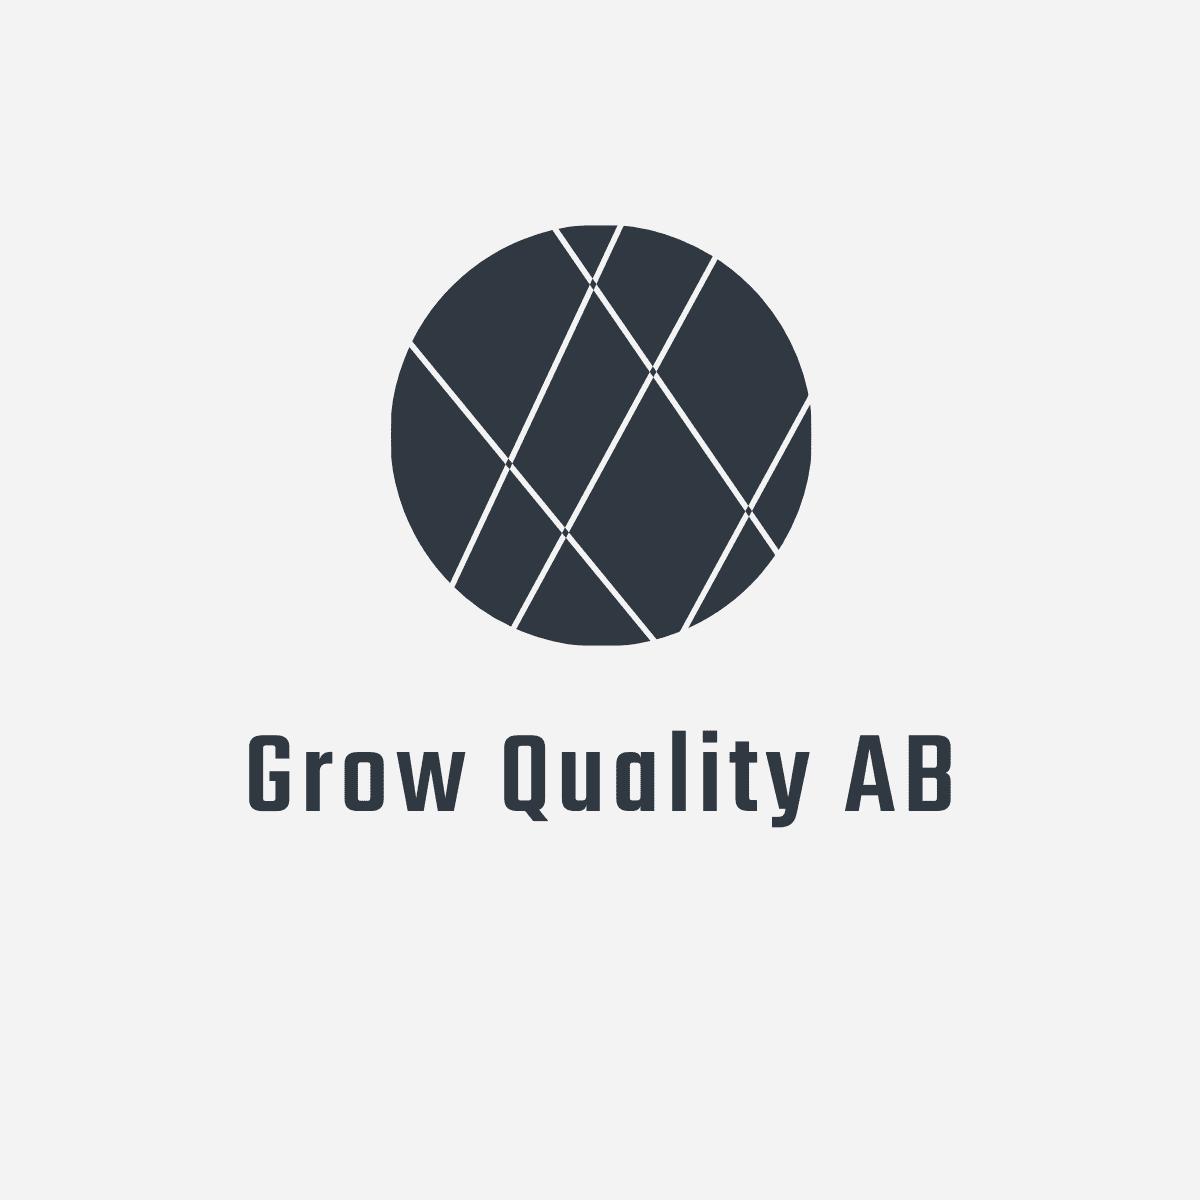 Grow Quality AB